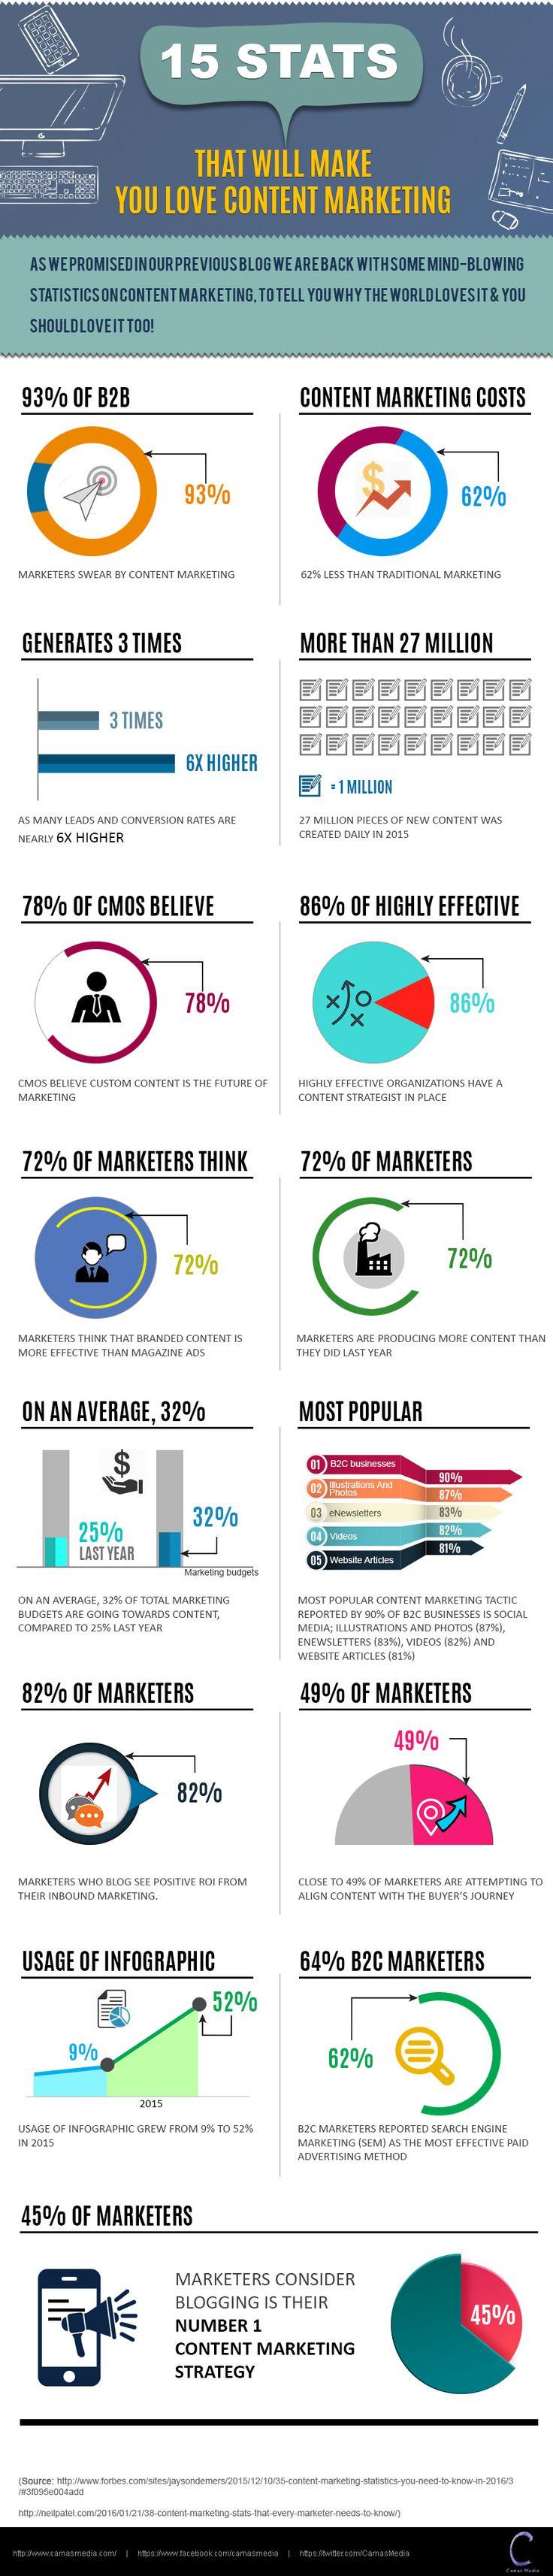 15 Stats That Will Make You Love #contentmarketing. #CamasSutra #infographics #inboundmarketing #marketingtips #stats #entrepreneurs #branding   